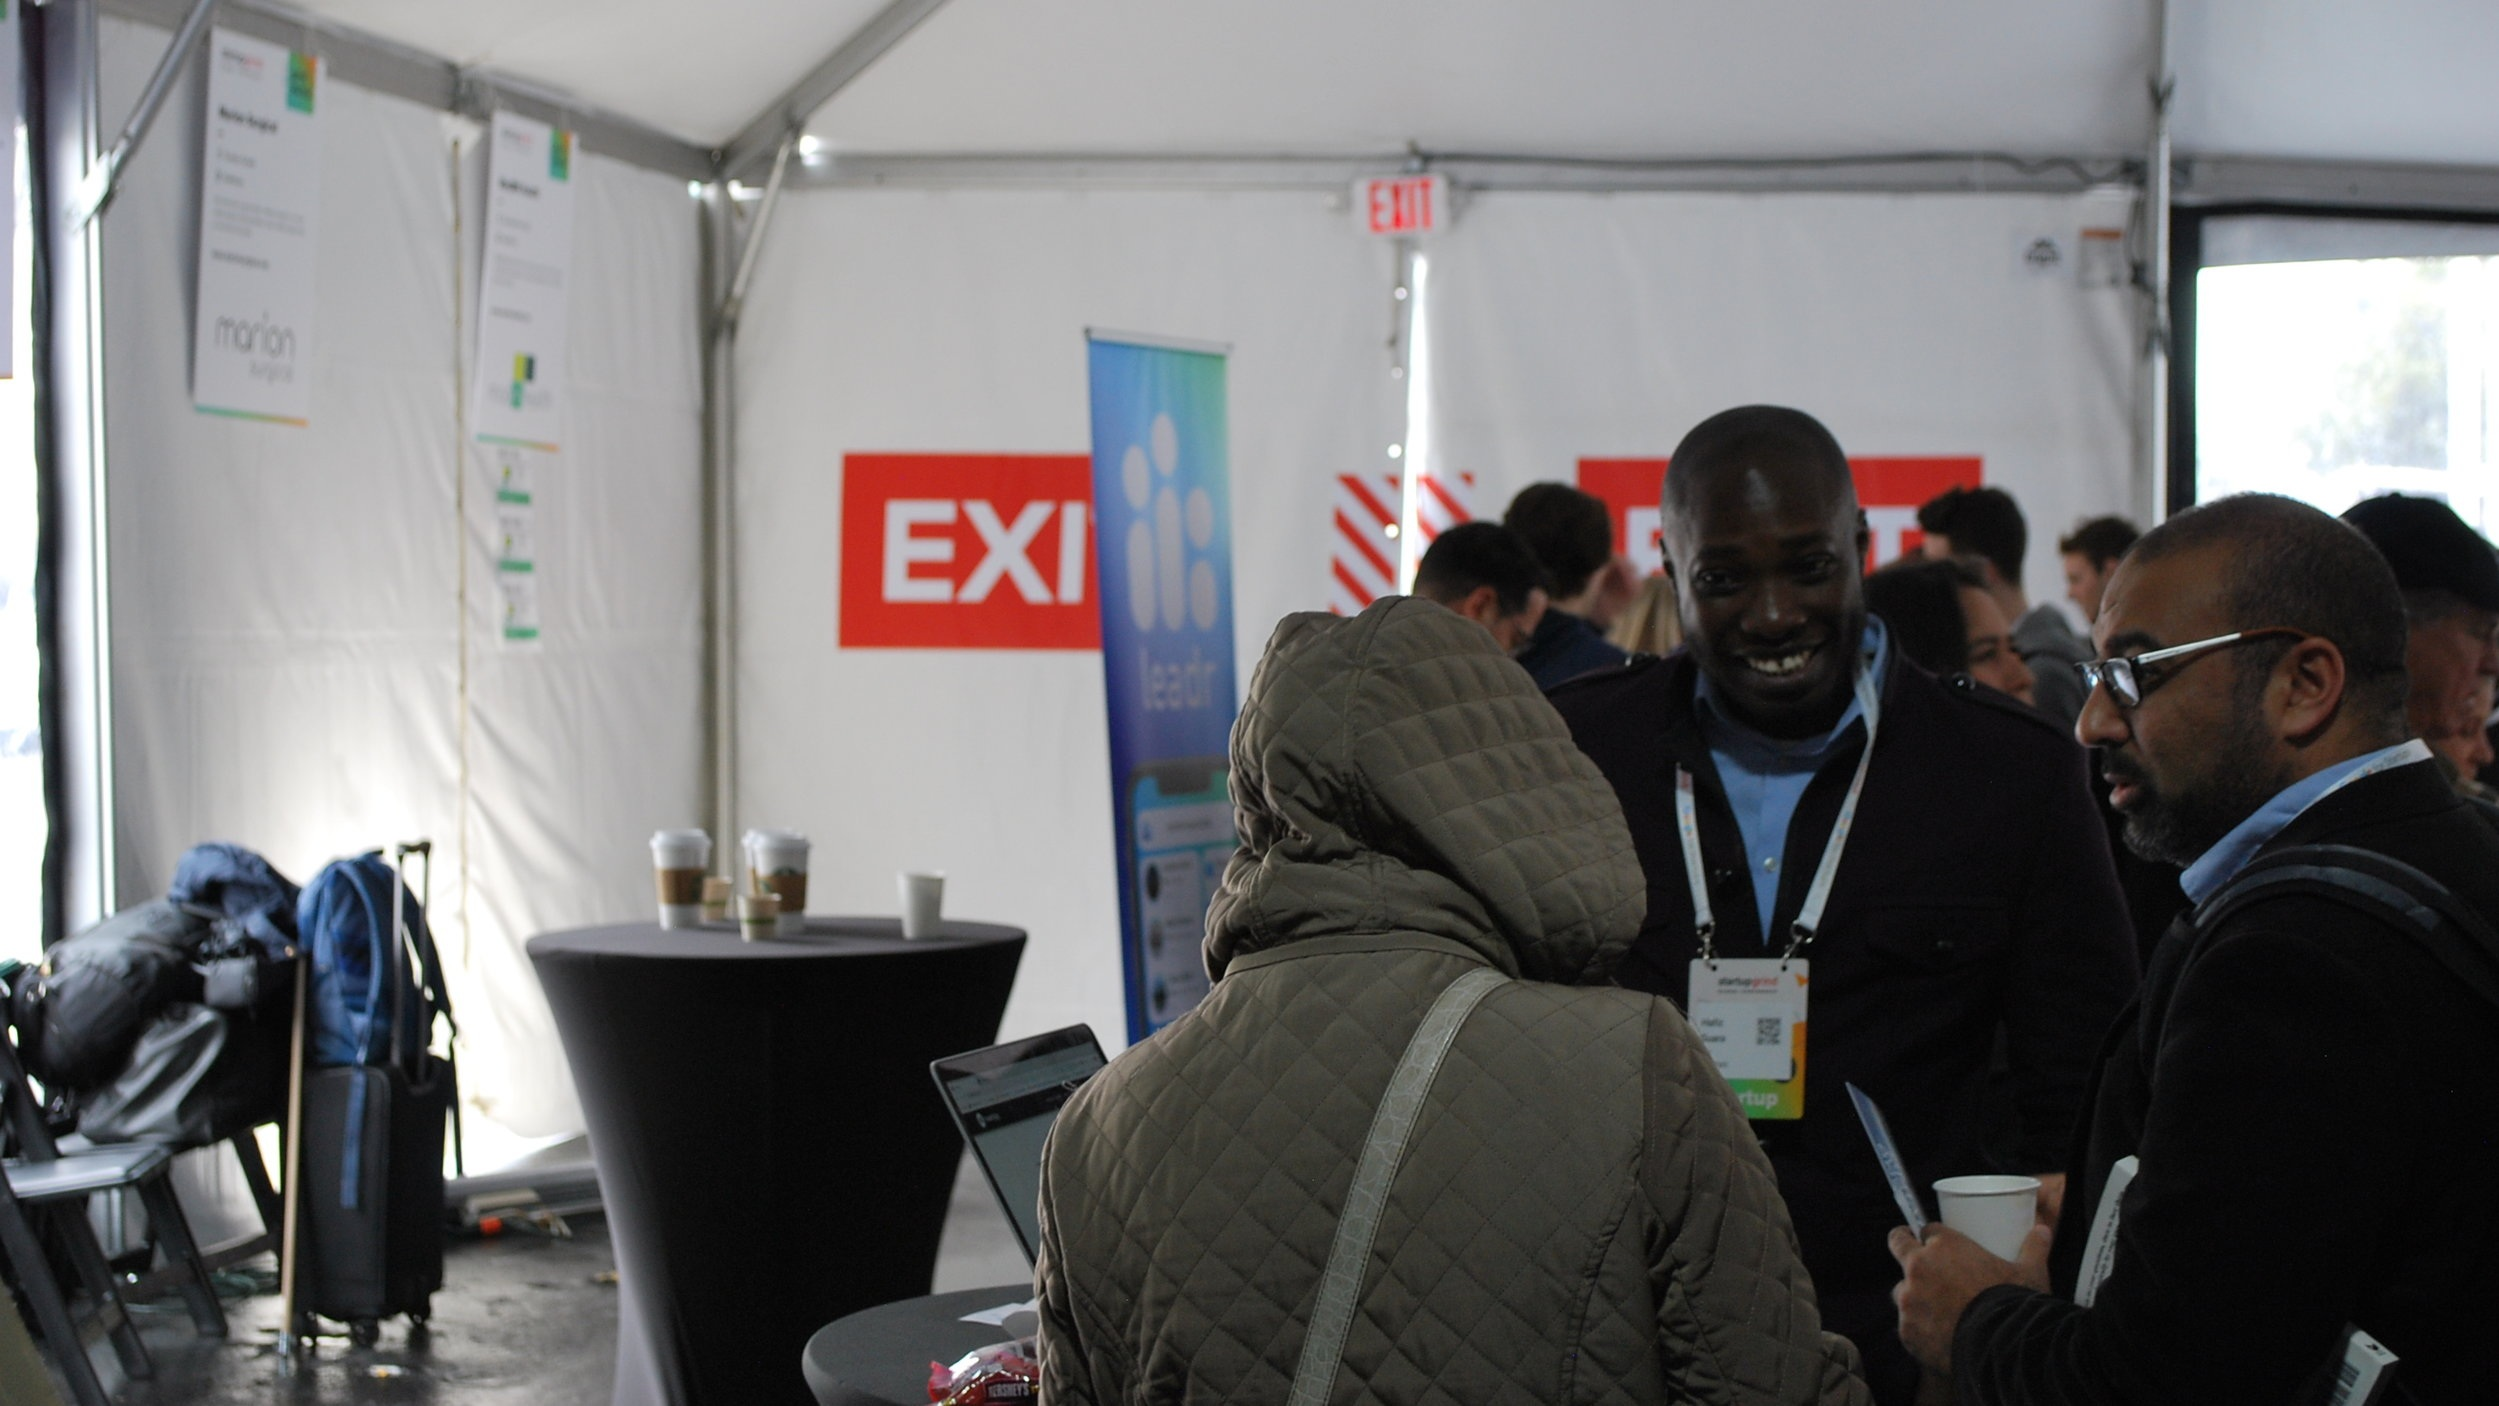 Hafiz Suara, Co-founder at healthgig exhibiting at Startup Grind Global